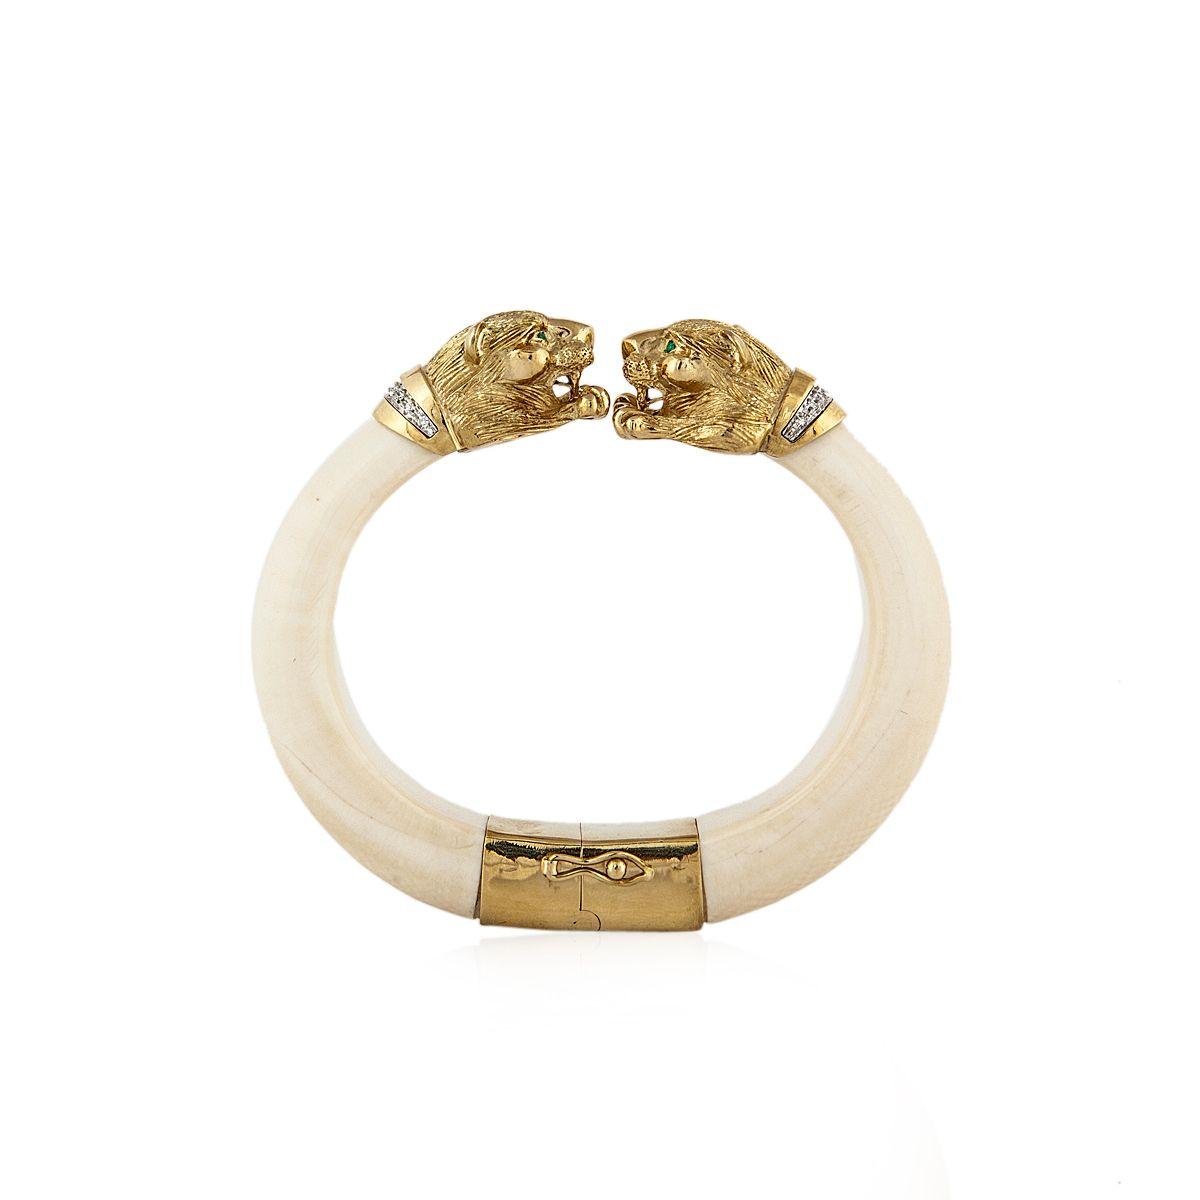 Tenenbaum & Co. - Houston, TX Ivory, Diamond, Emerald Lion Cuff $7,900.00